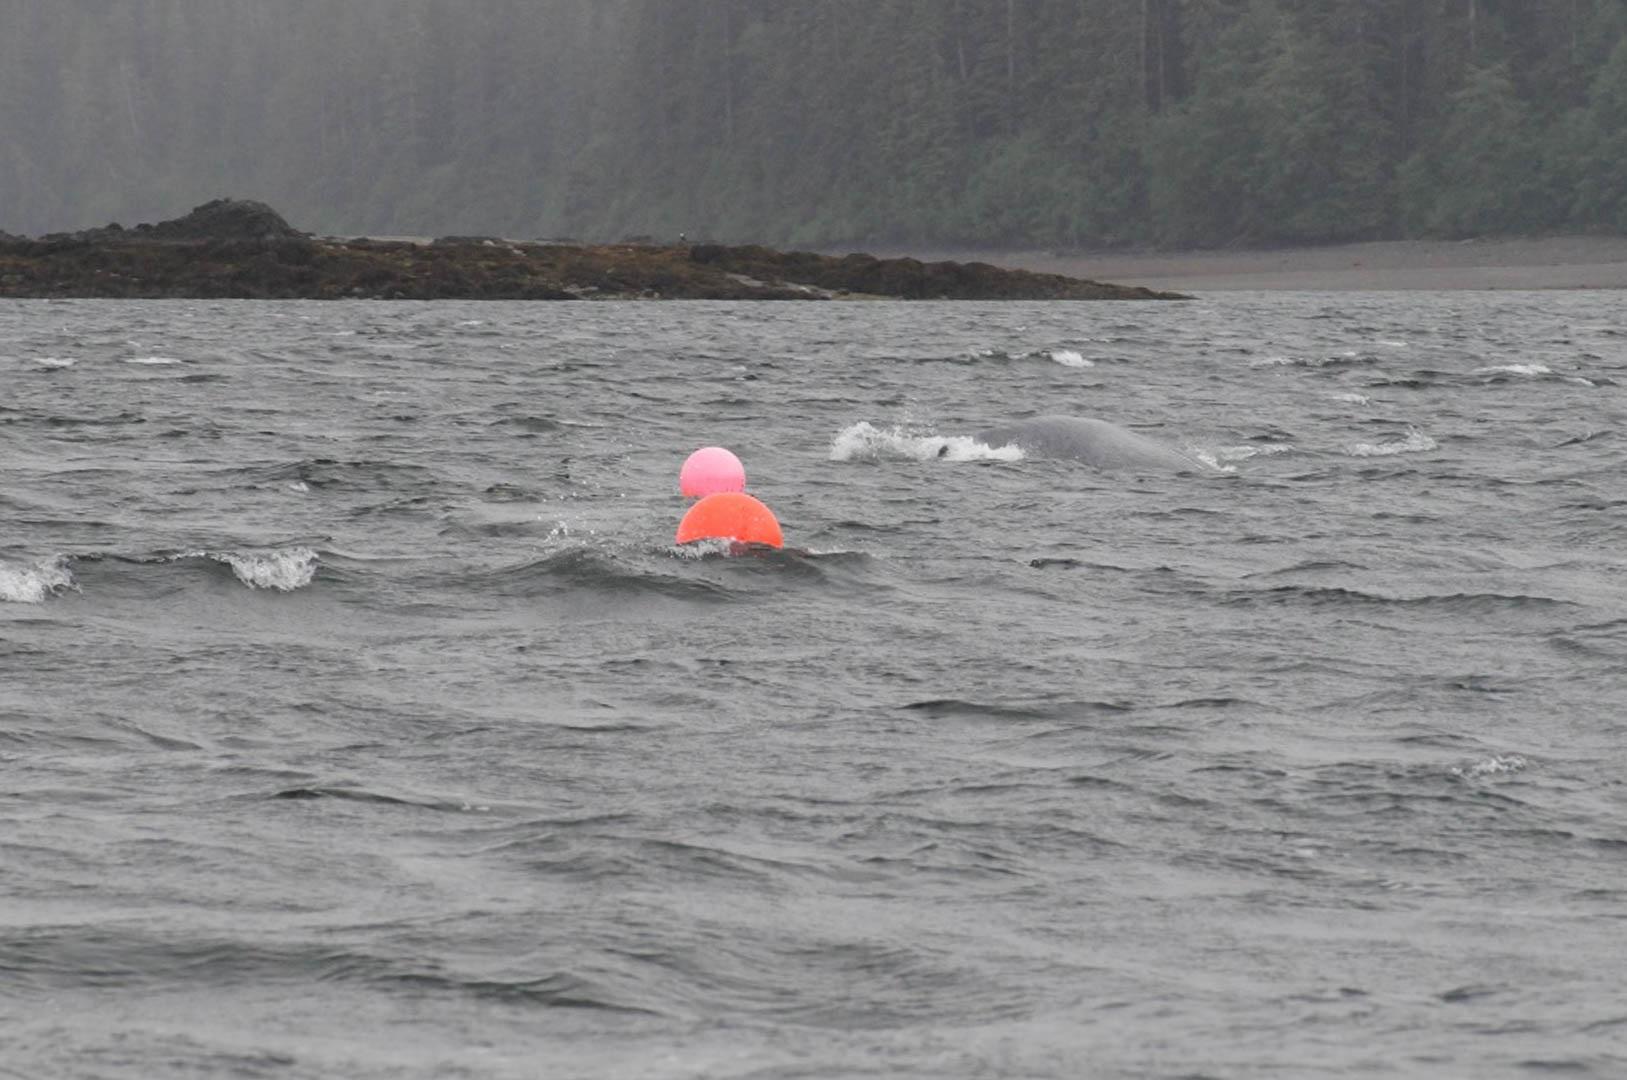 Ocean Tuesday: Capturing Value from Alaska's Ocean Resources